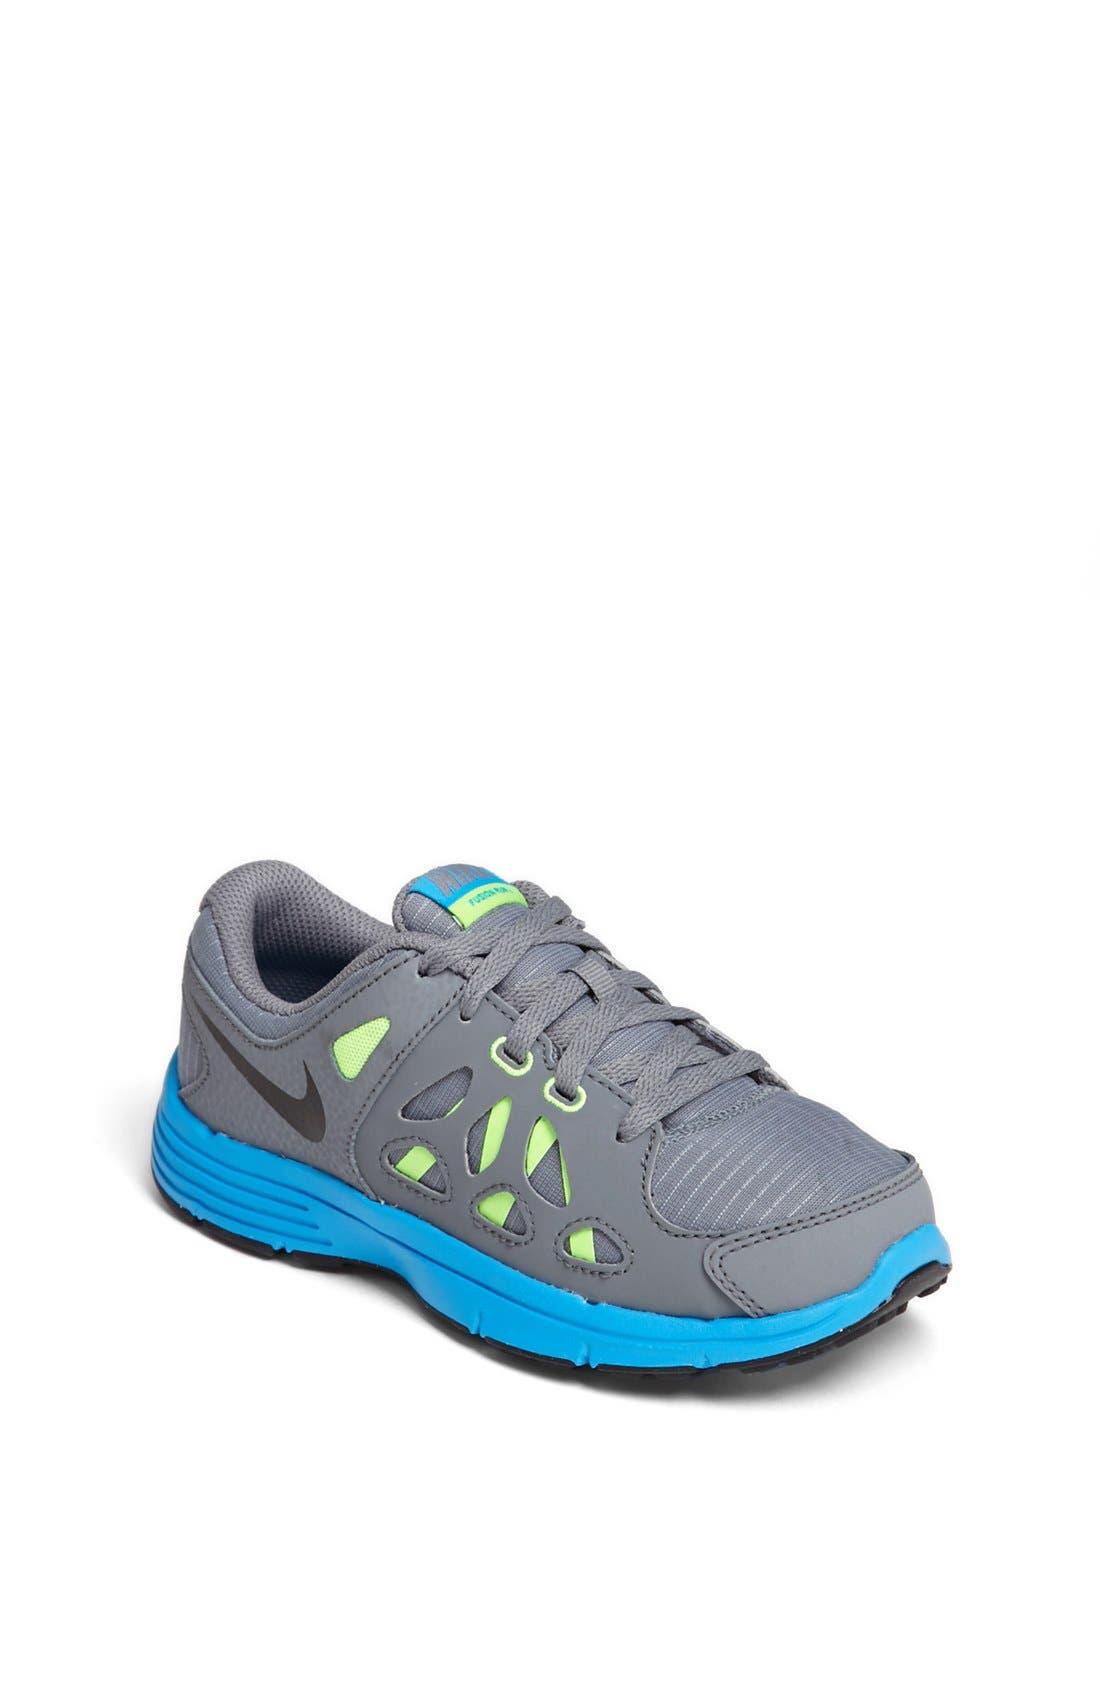 Main Image - Nike 'Dual Fusion' Sneaker (Little Kid)